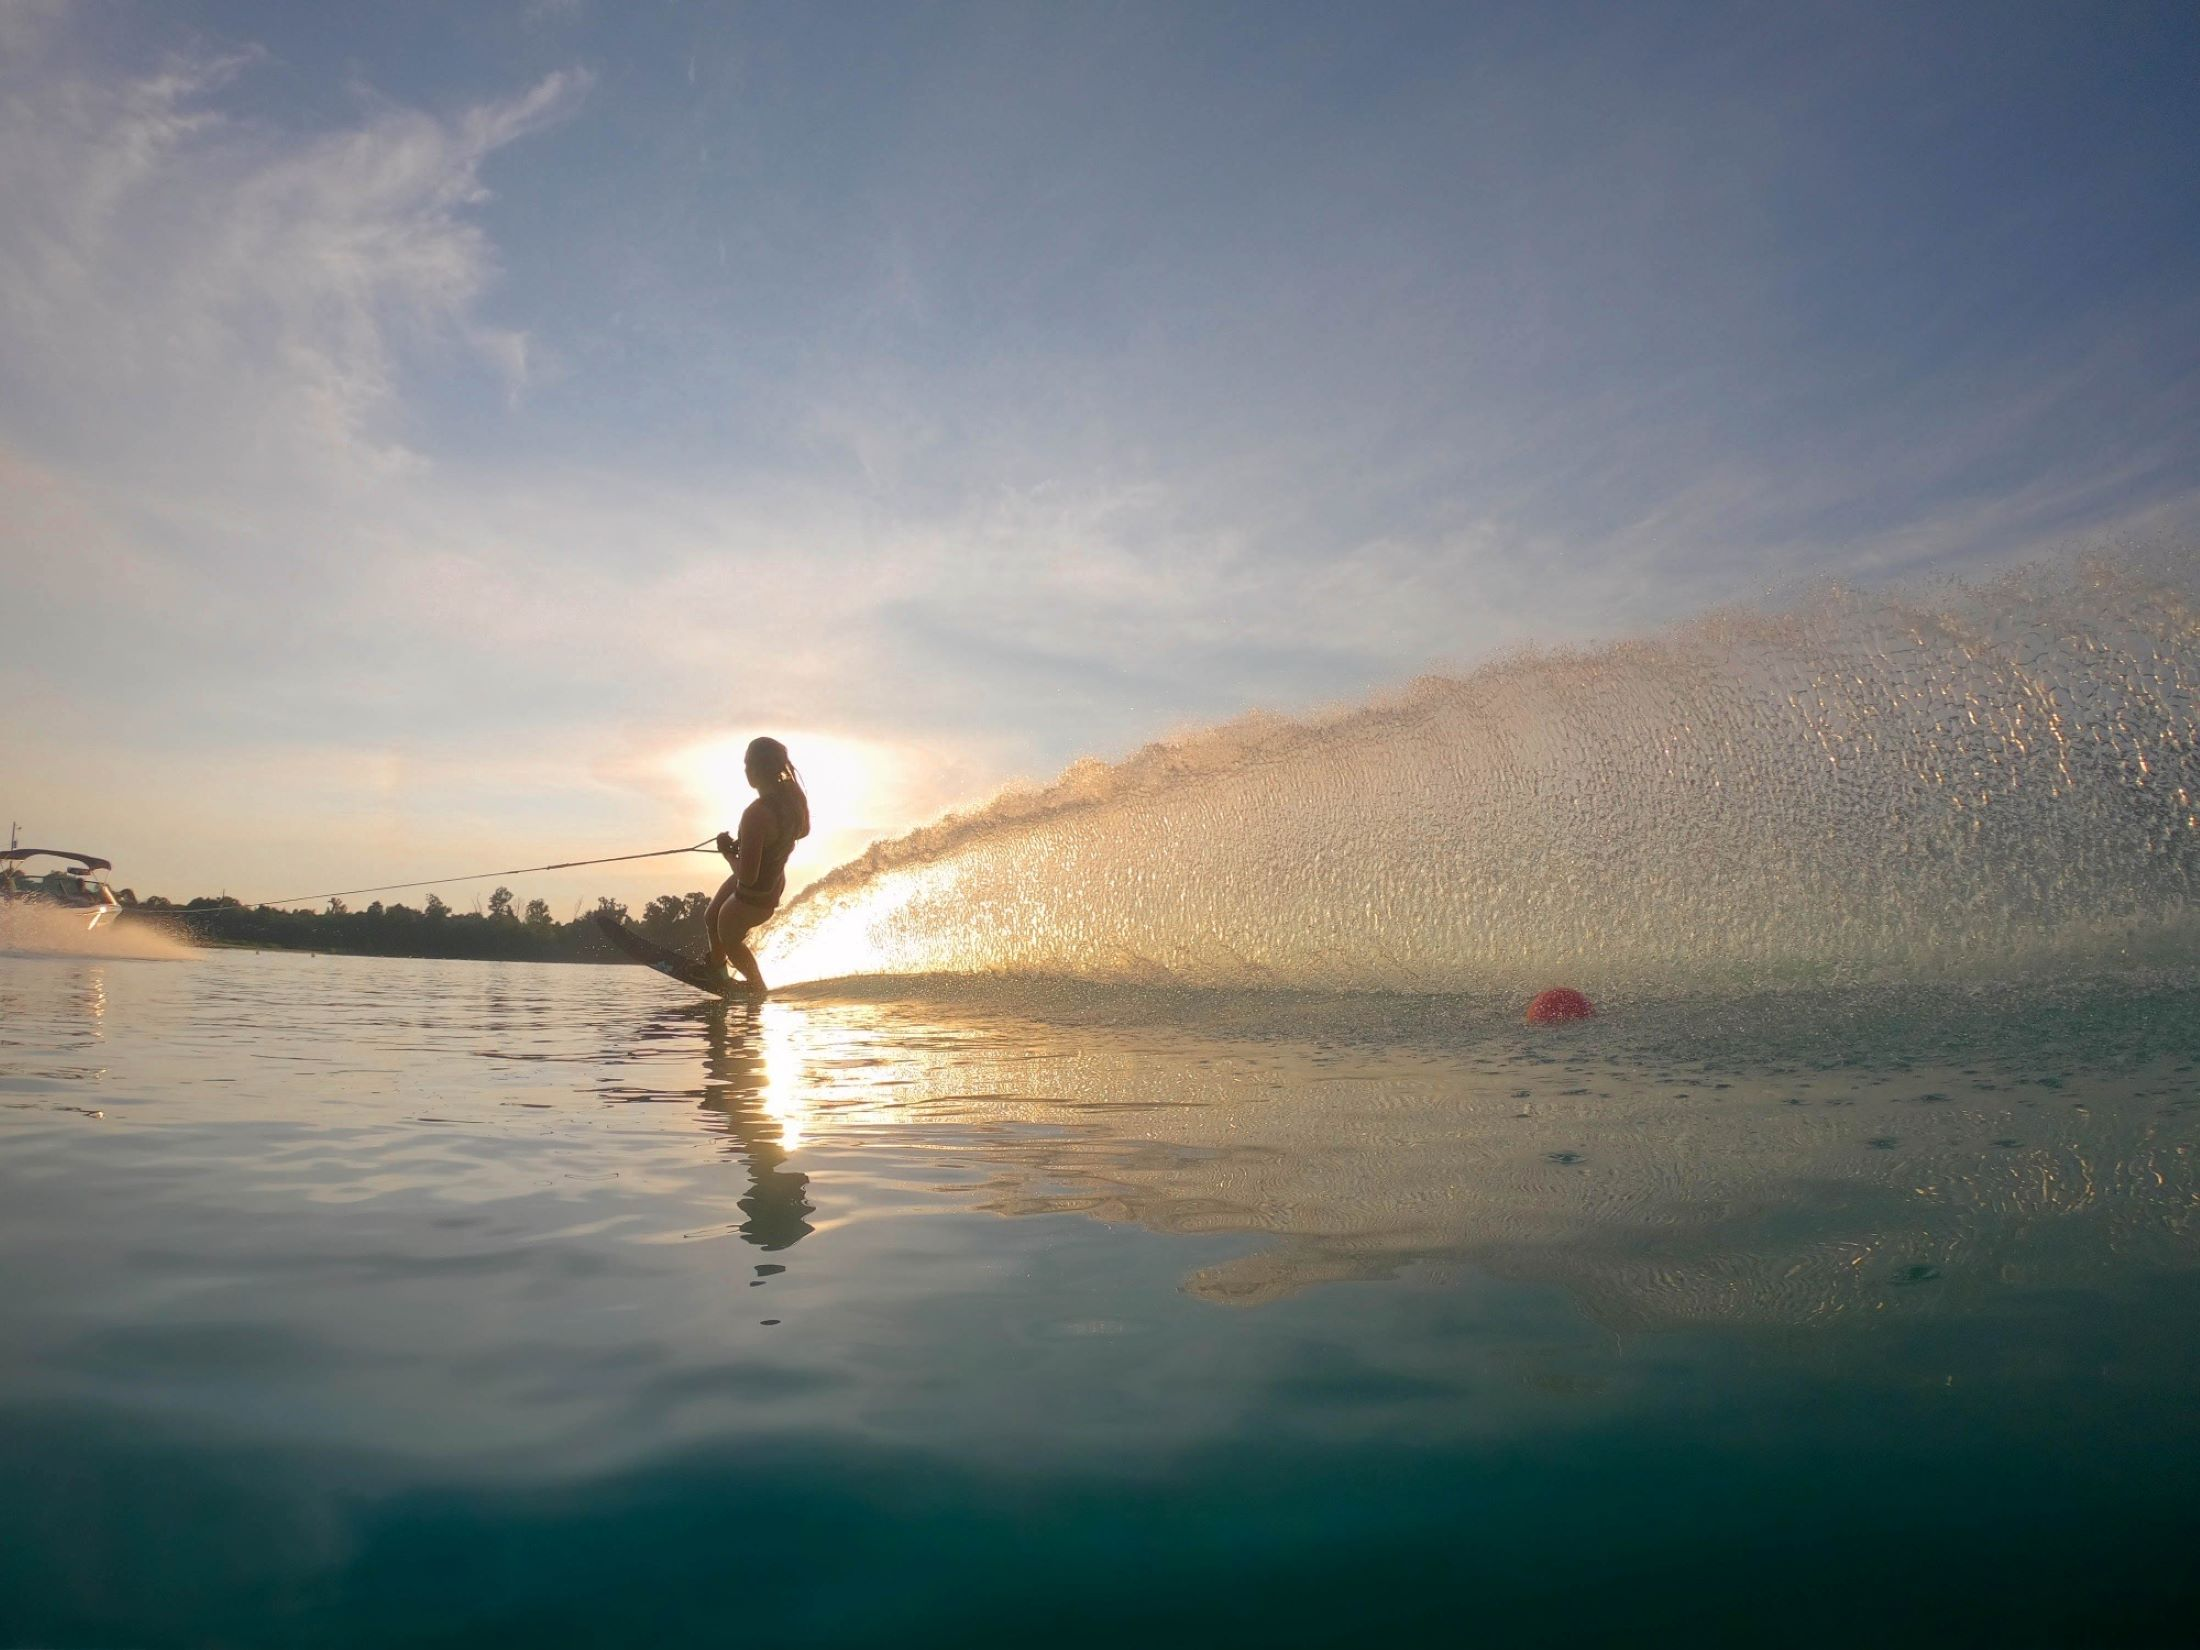 Nebraska Water Ski President skiing at sunrise